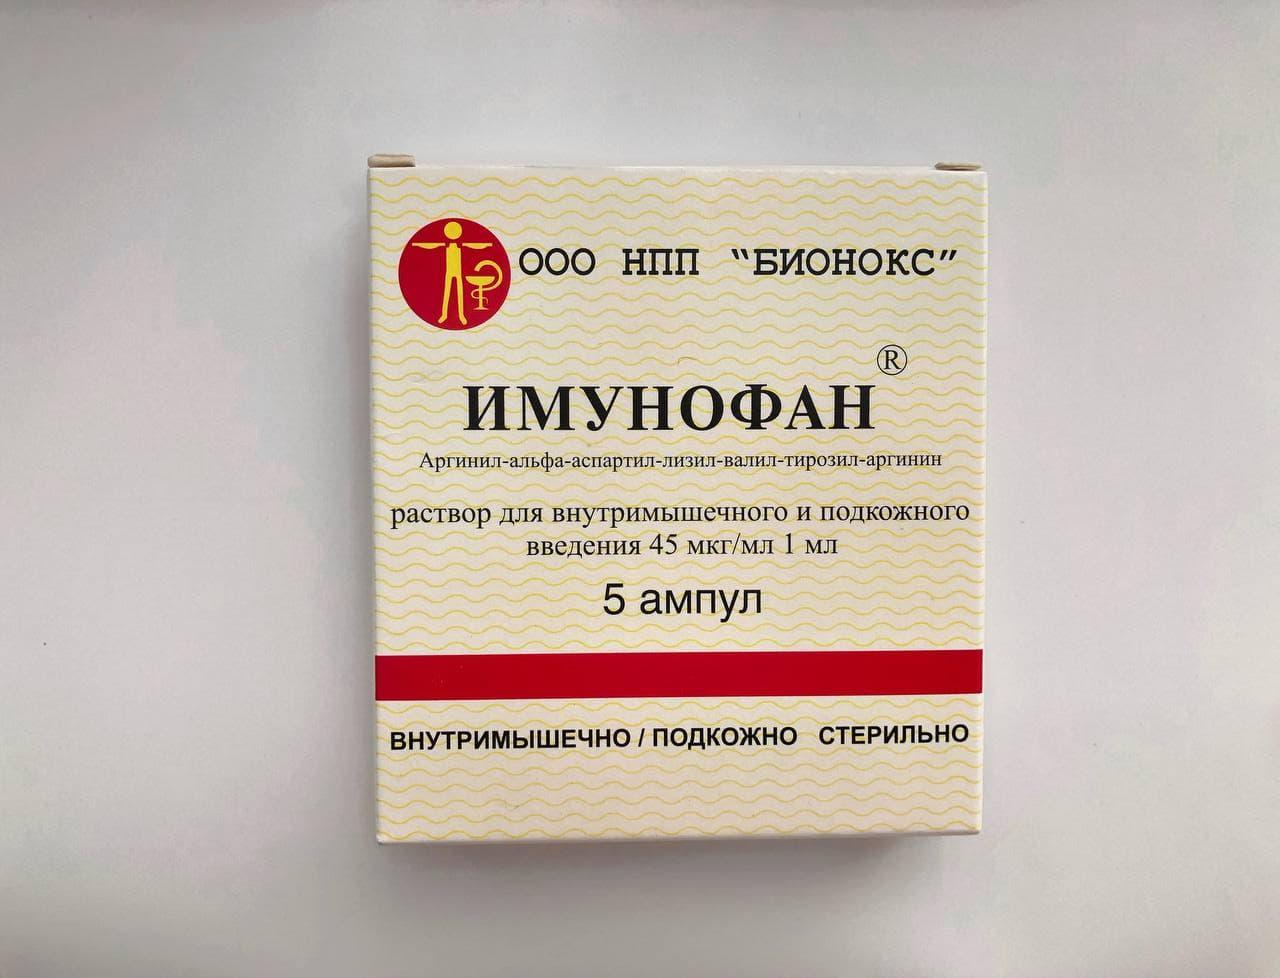 Имунофан